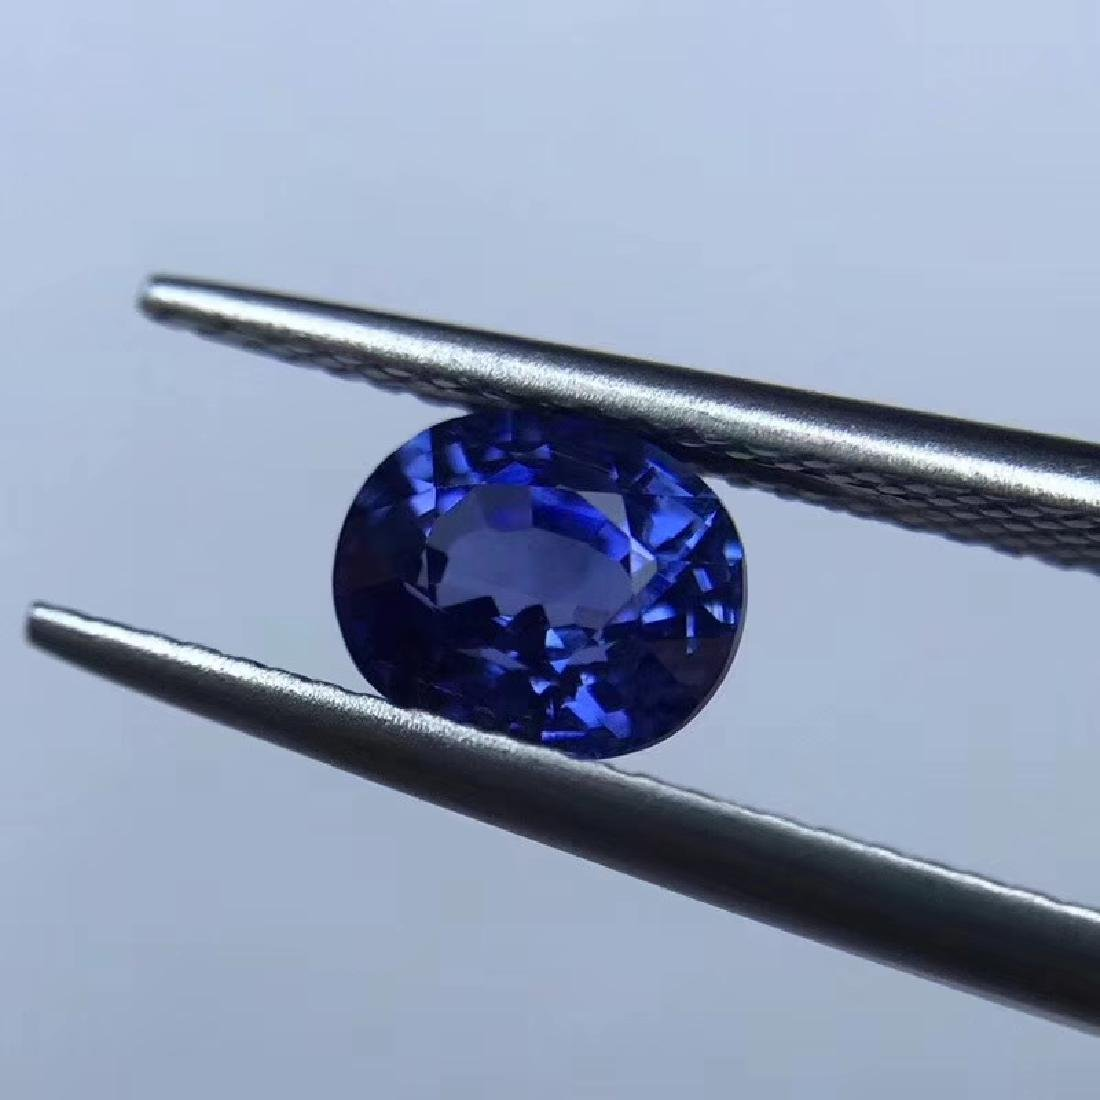 1.69 ct Sapphire 4.6*6.9*5.9 mm Oval Cut